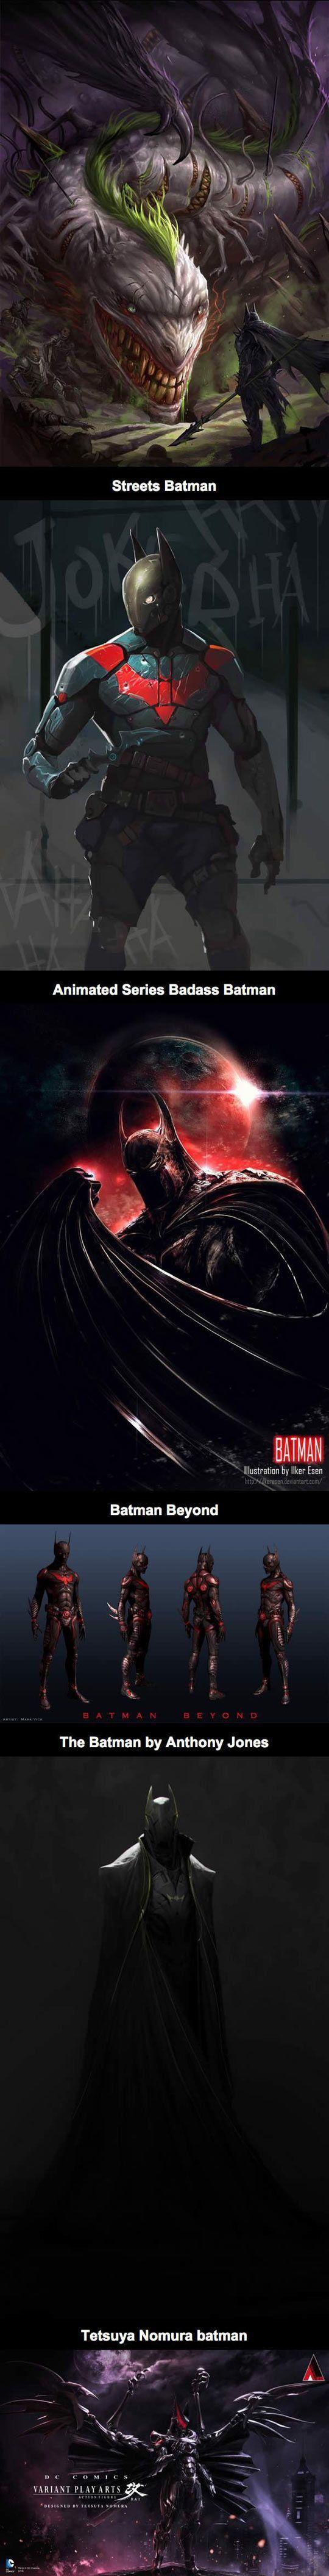 Awesome Alternate Fan Art Takes On Batman - The Meta Picture: